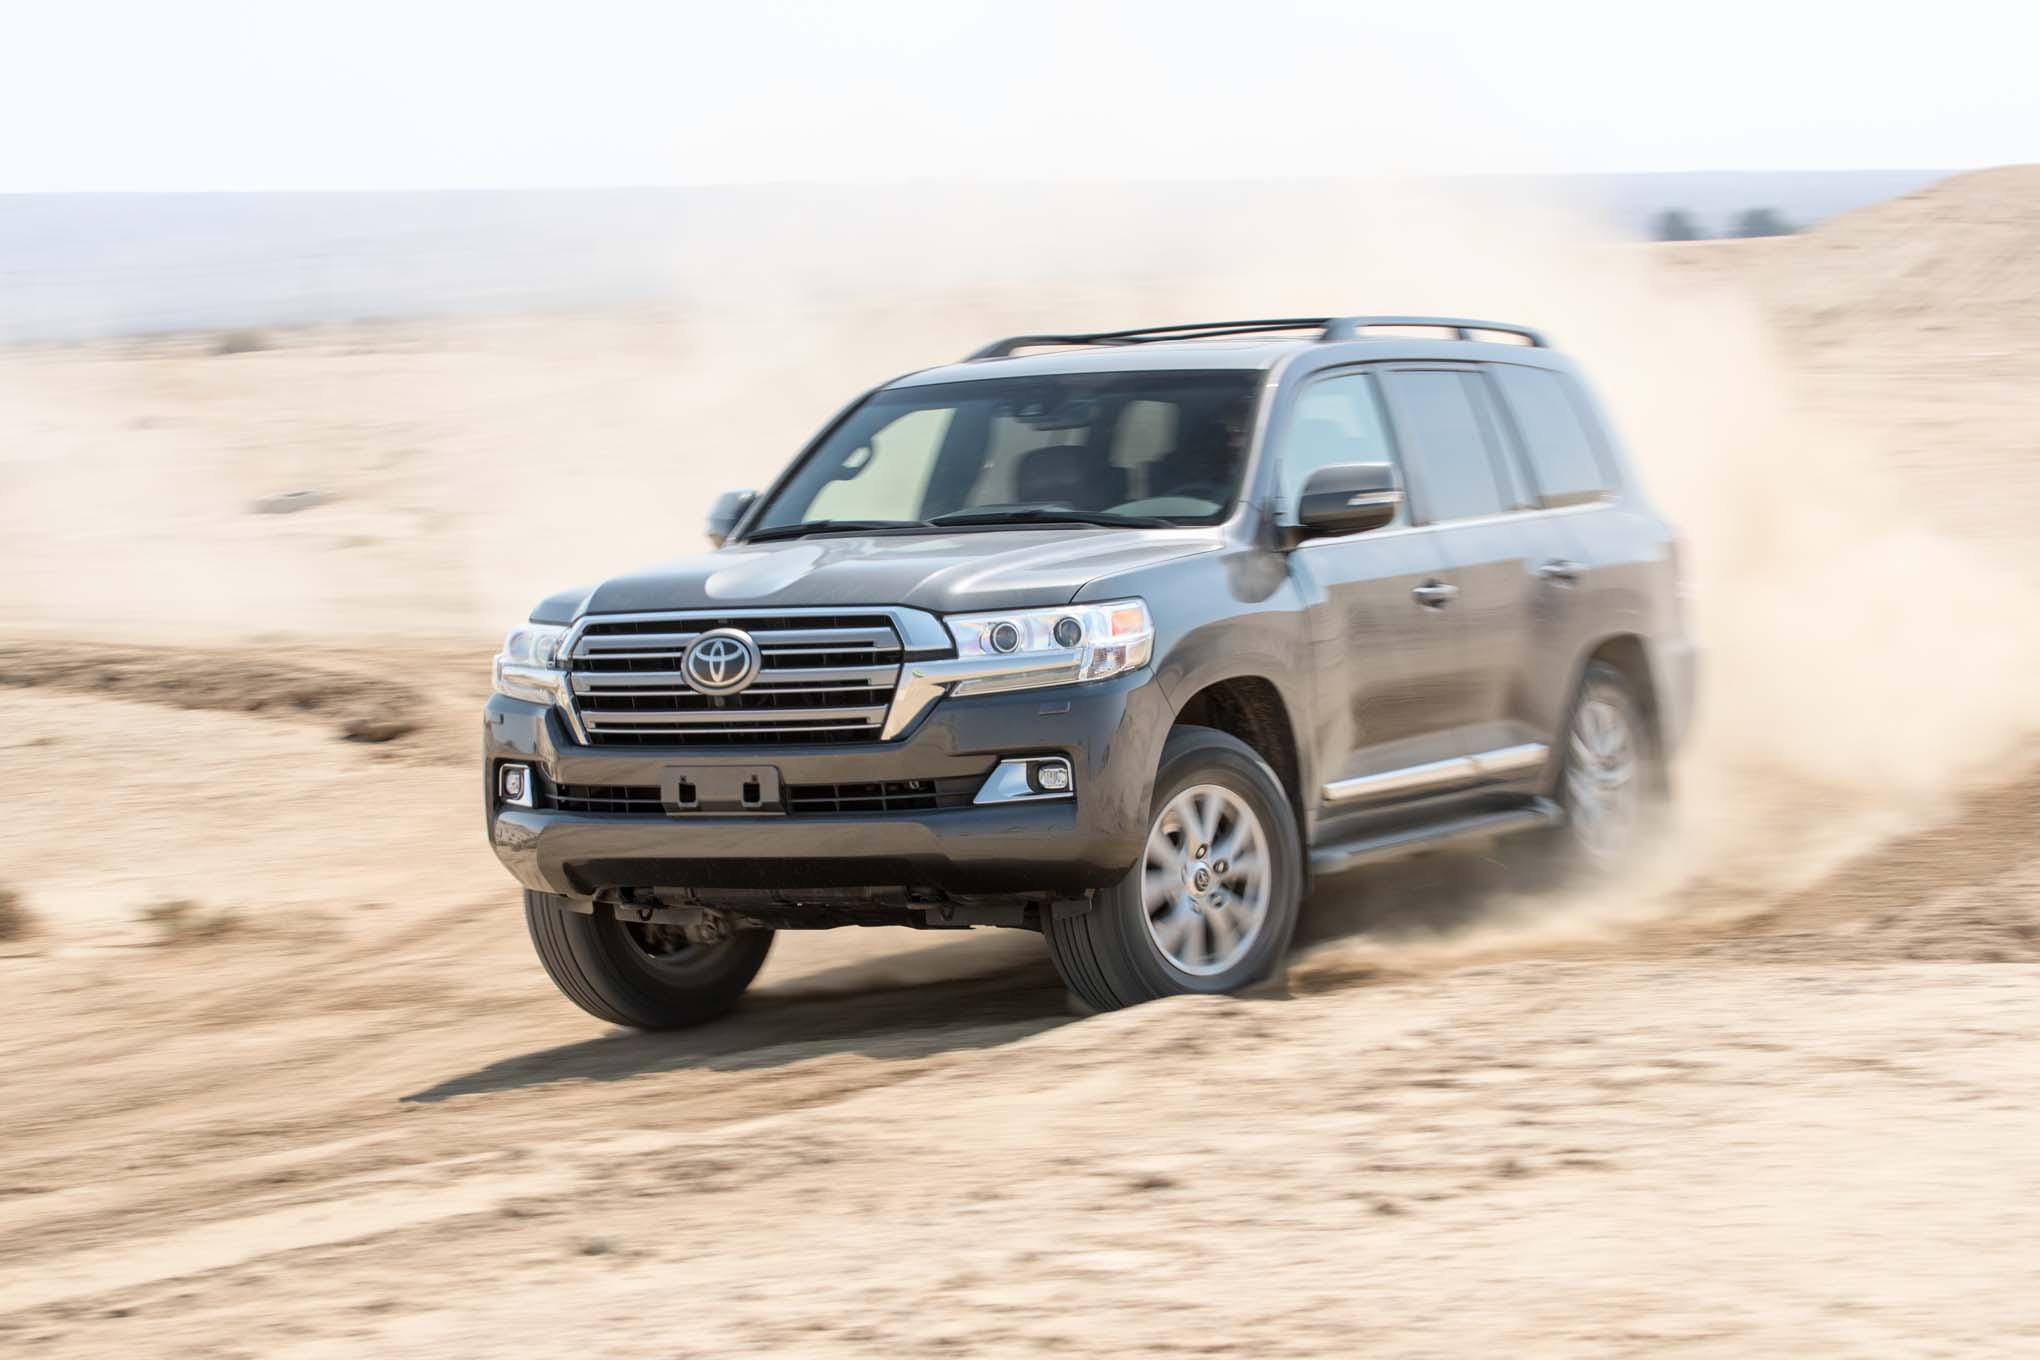 2016 Toyota Land Cruiser Front Three Quarter In Motion